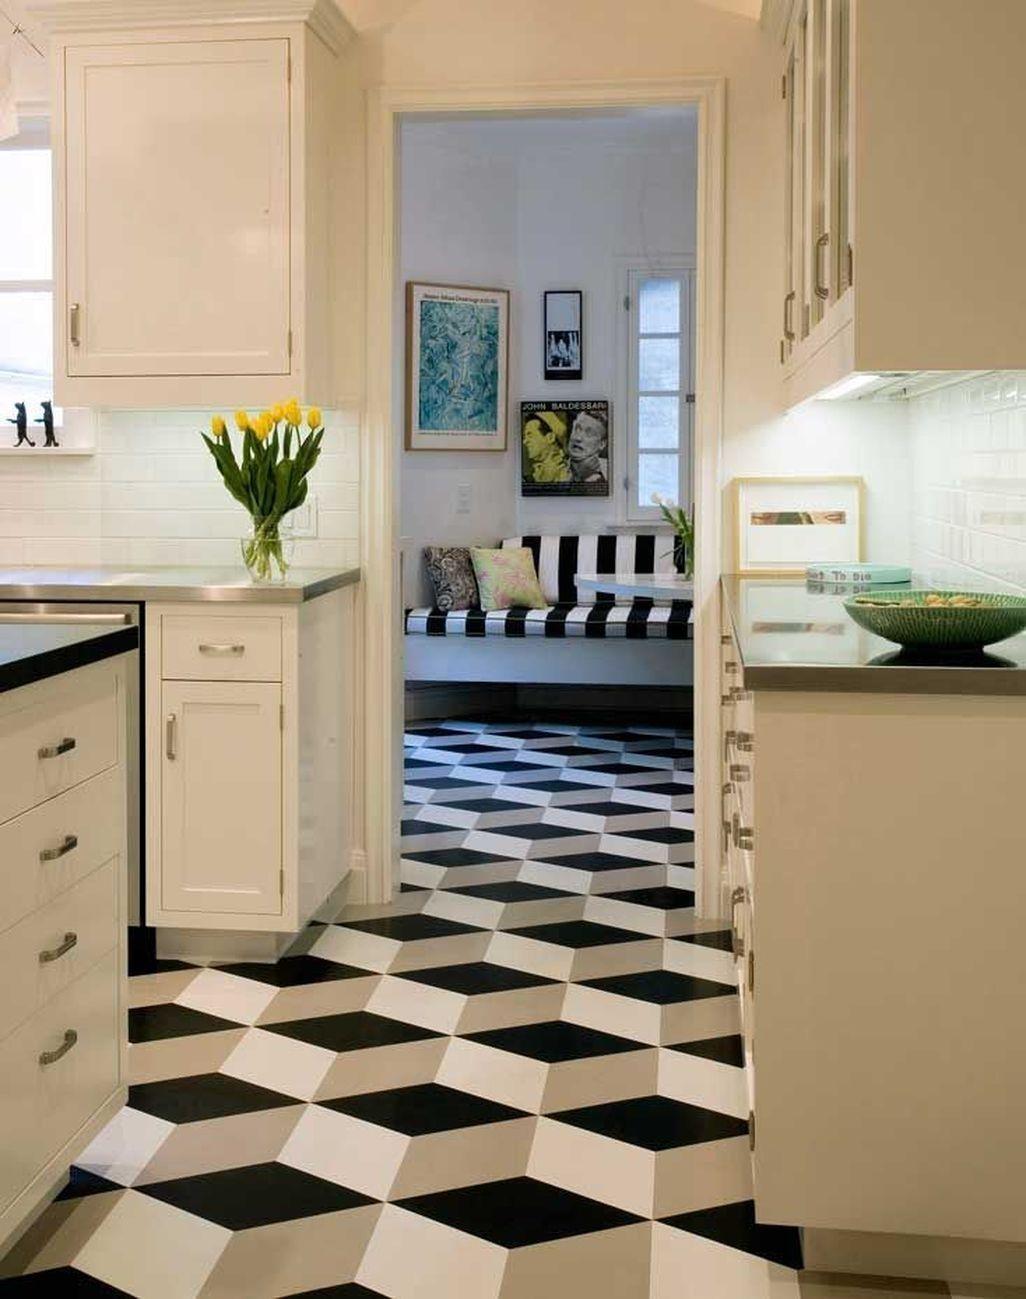 Pin By Pedro Ruiz On Facebook Geometric Tile Floor Inlay Flooring Floor Design